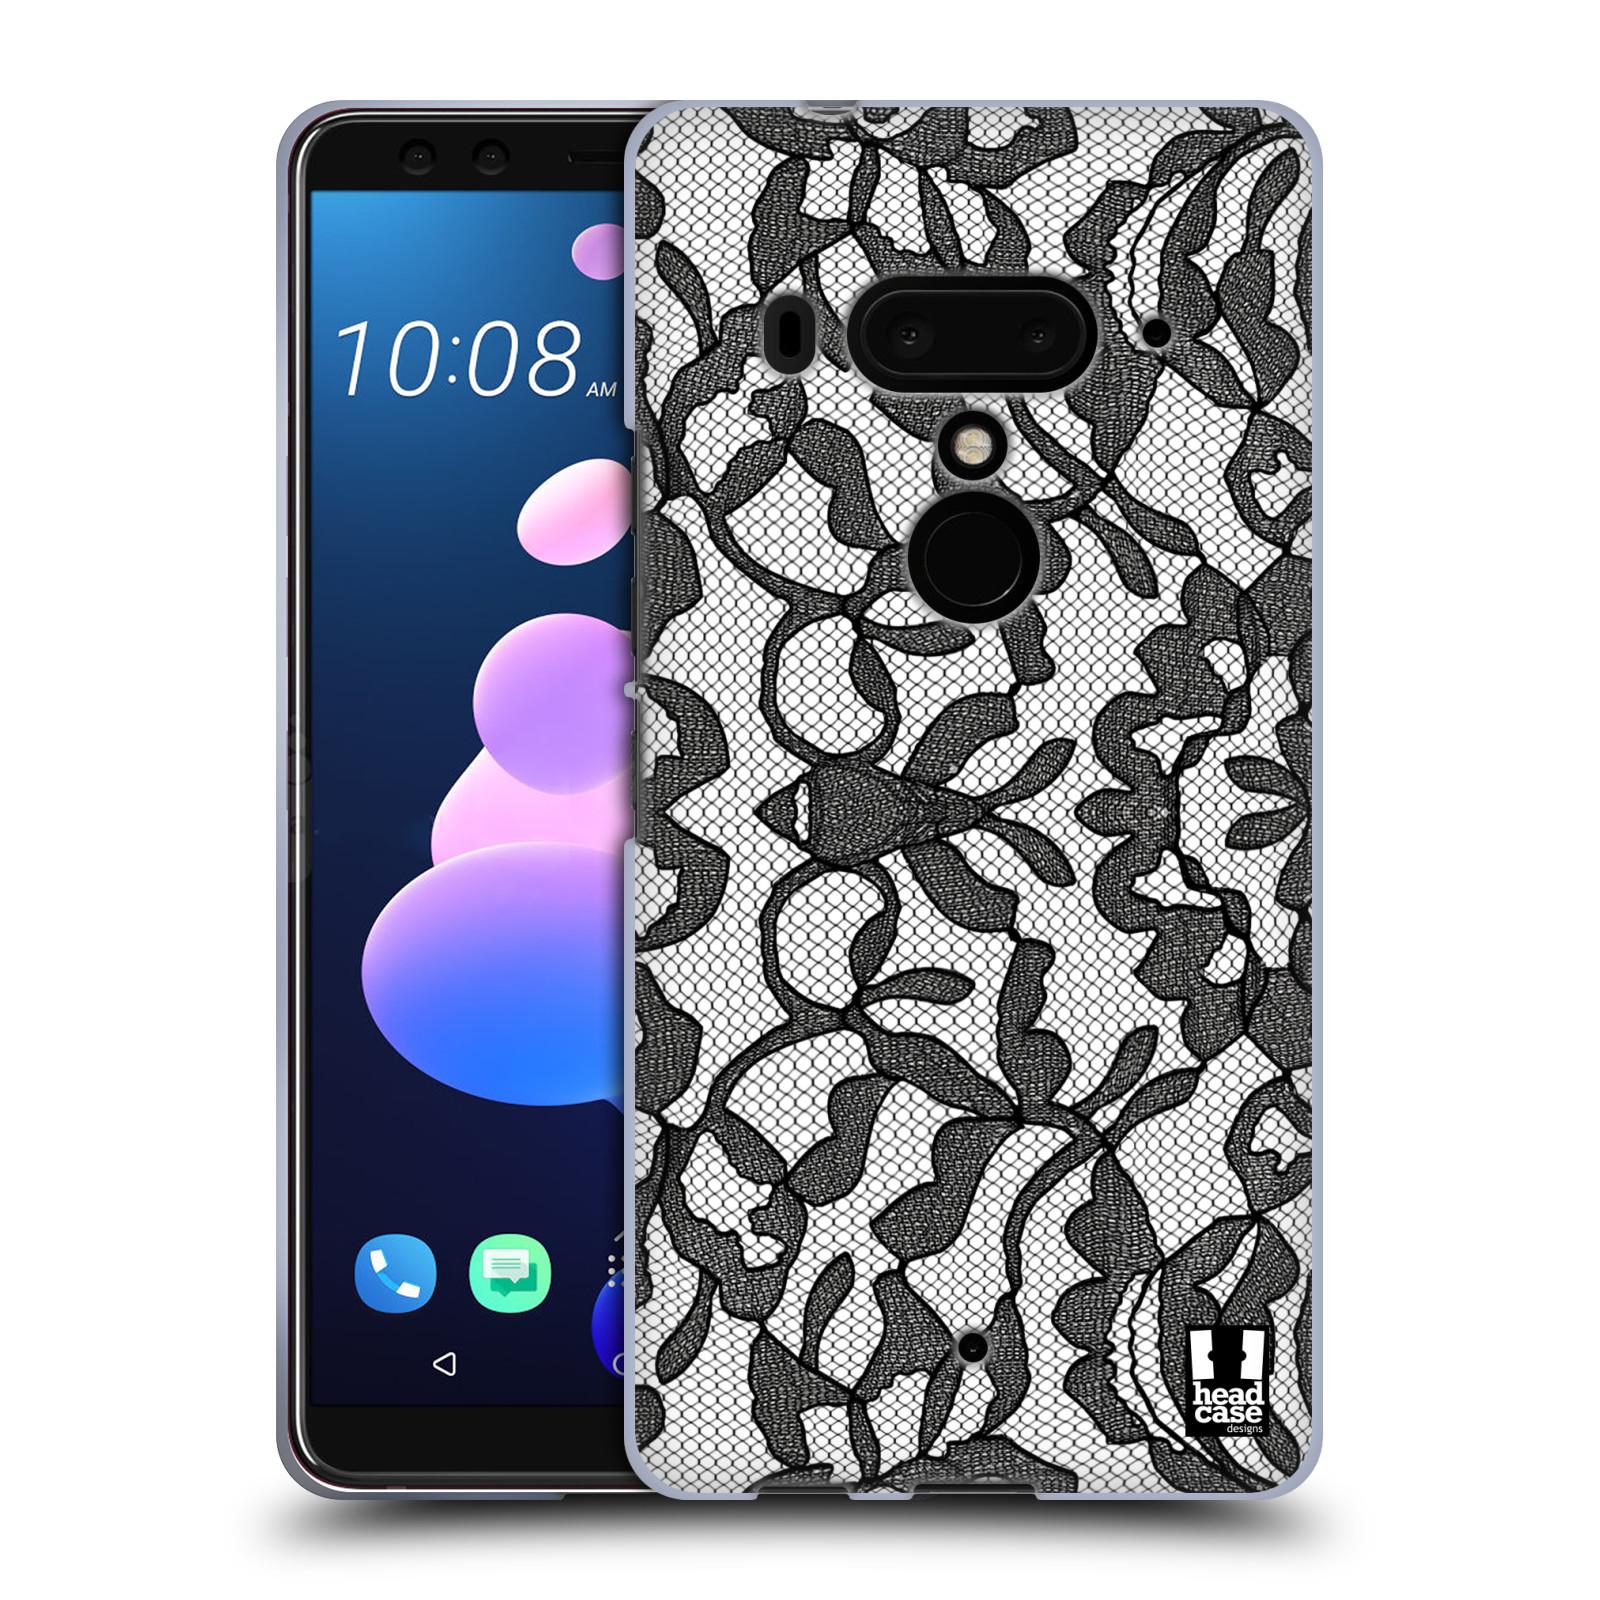 Silikonové pouzdro na mobil HTC U12 Plus - Head Case - LEAFY KRAJKA